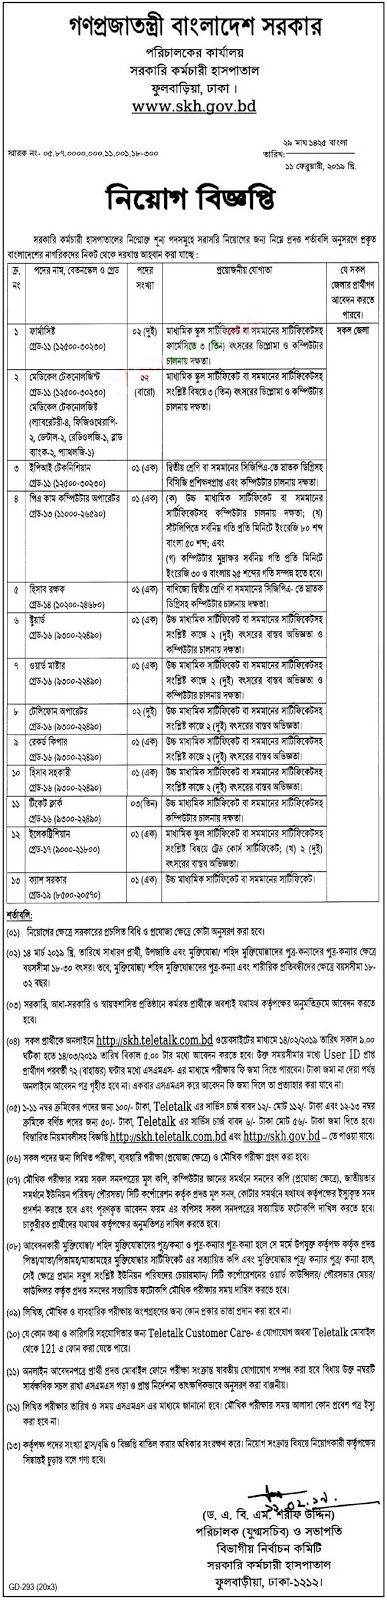 Sarkari Karmachari Hospital (SKH) Job Circular 2019